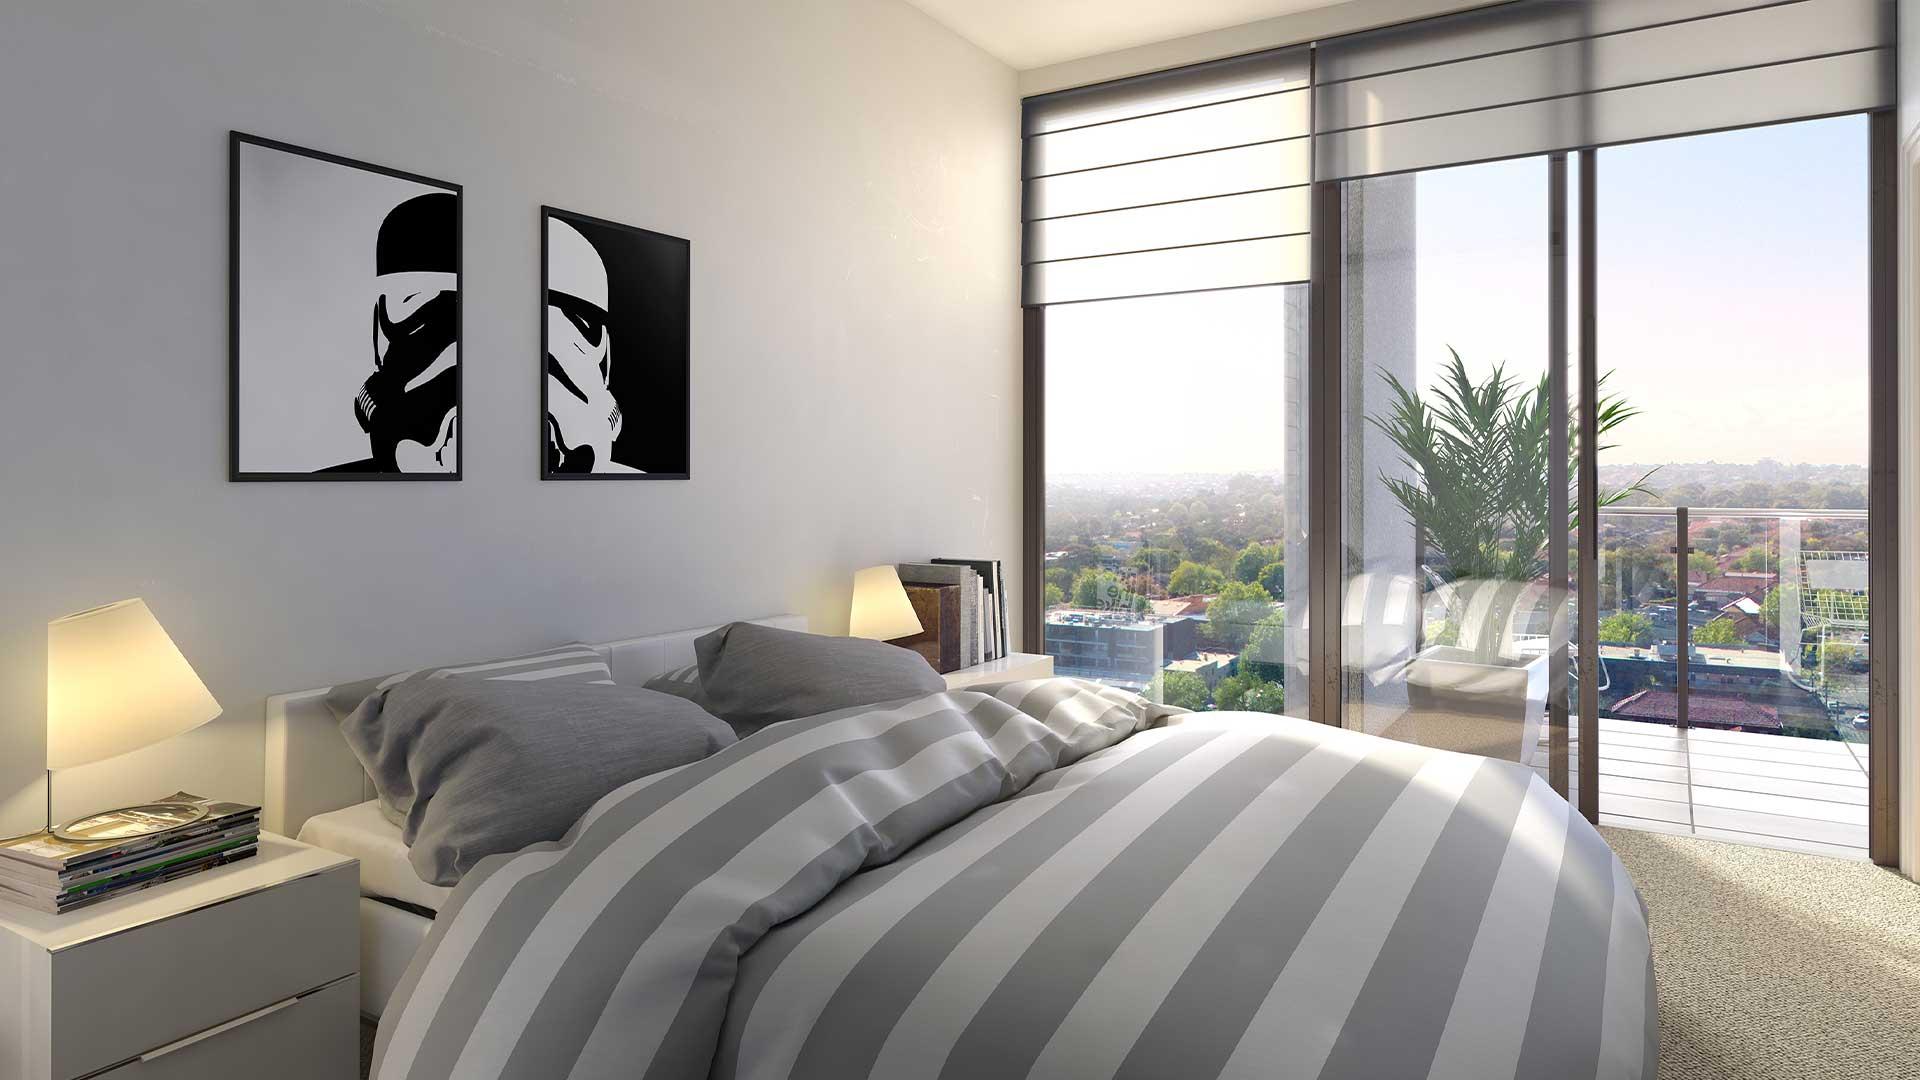 Real Estate VR Image by Start Beyond 03